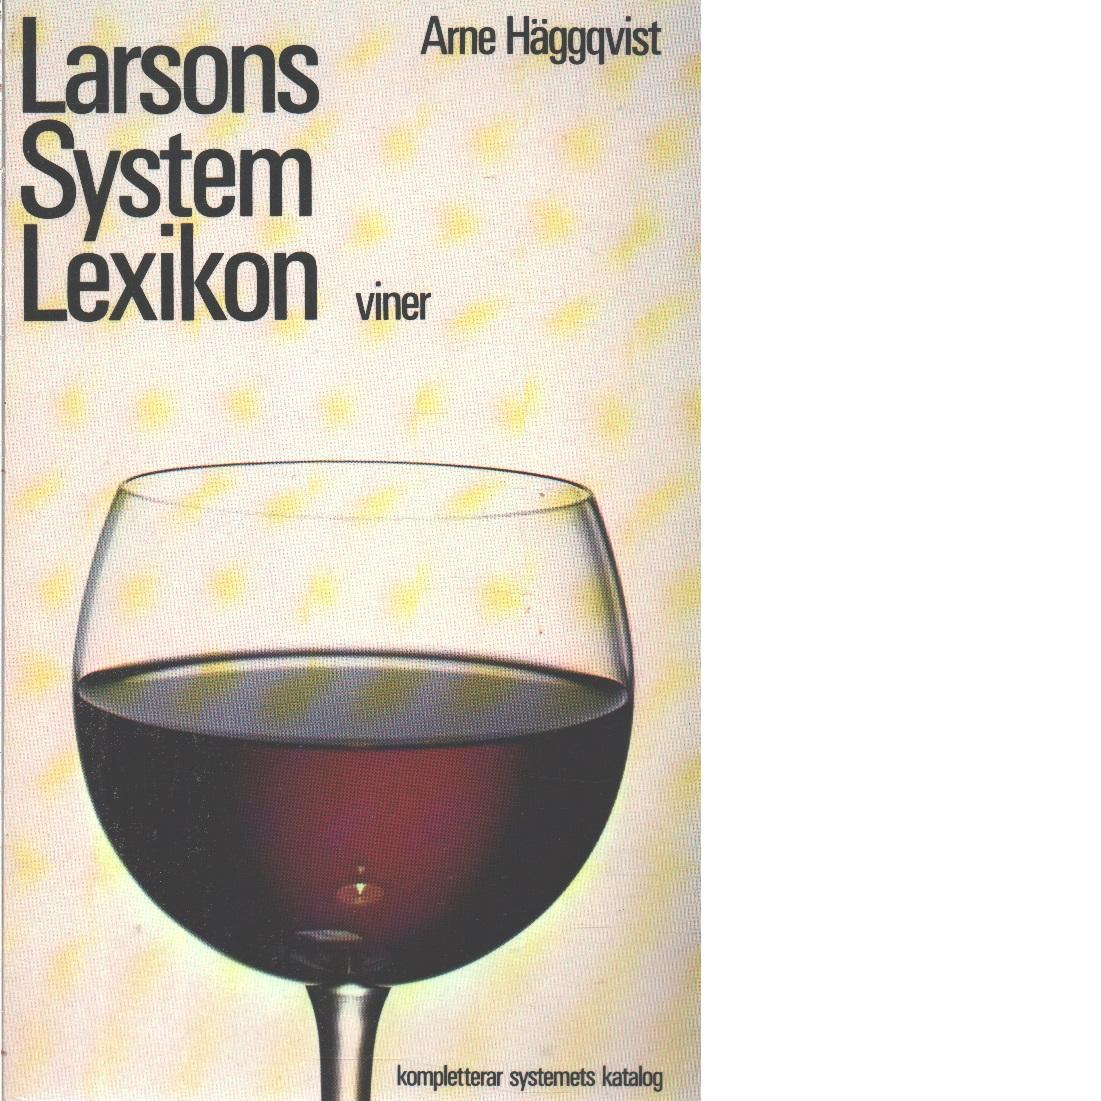 Larsons systemlexikon. 1, Viner  - Häggqvist, Arne